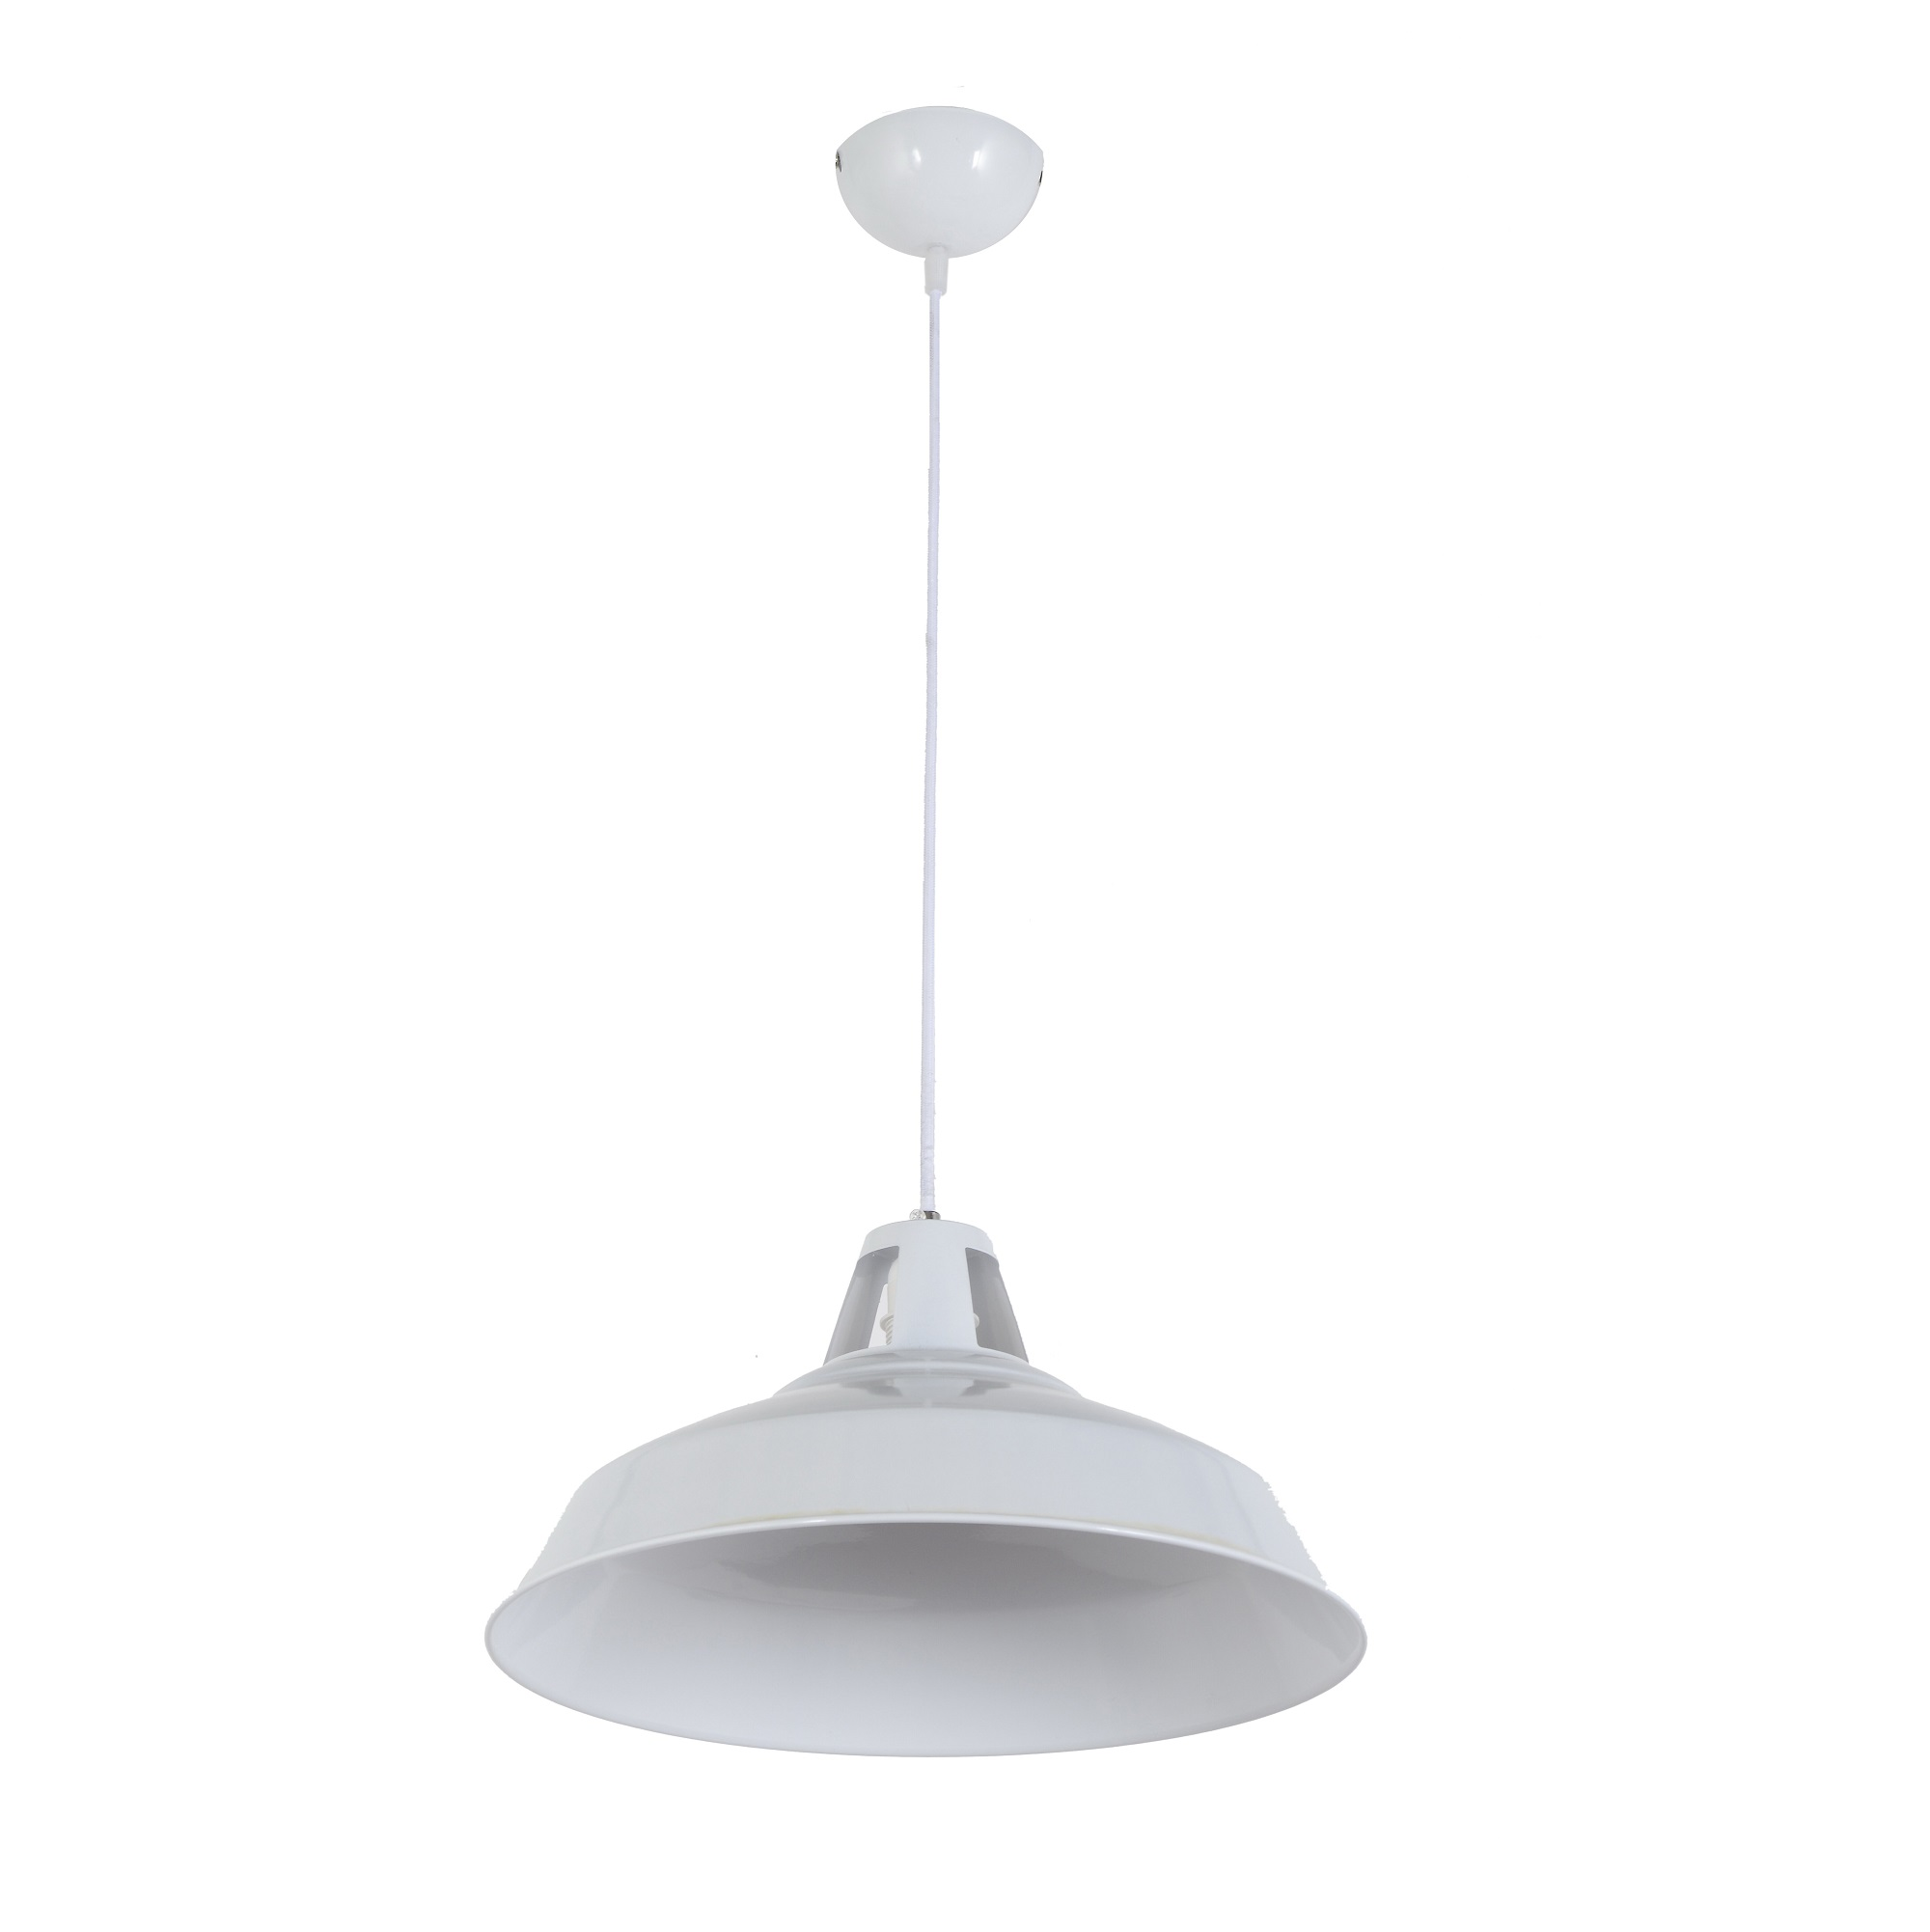 Фото - Подвесной светильник Arti Lampadari Faustino E 1.3.P1 W подвесной светильник arti lampadari olio e 1 3 p1 br